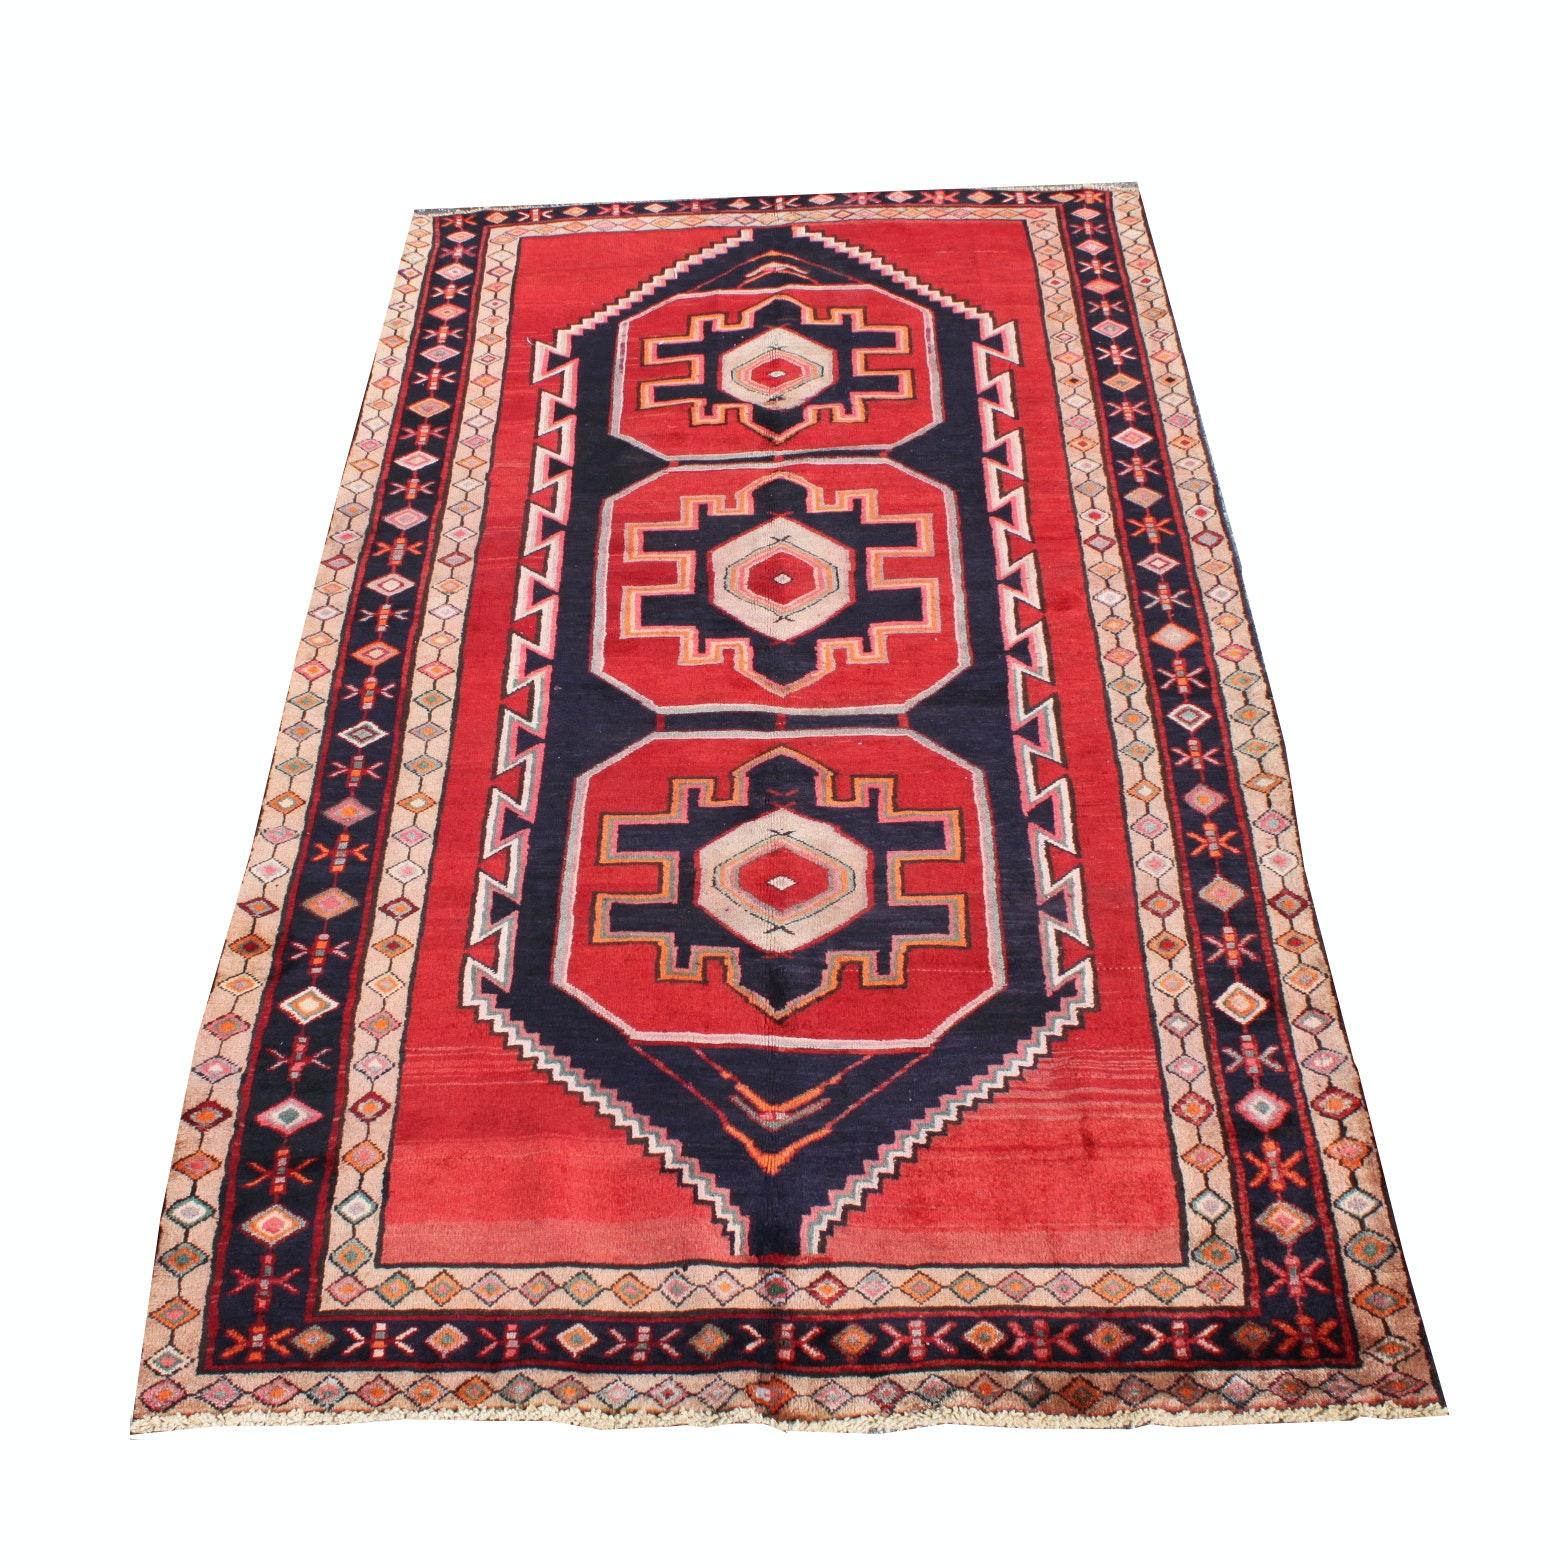 Hand-Knotted Persian Karaja Heriz Wool Area Rug